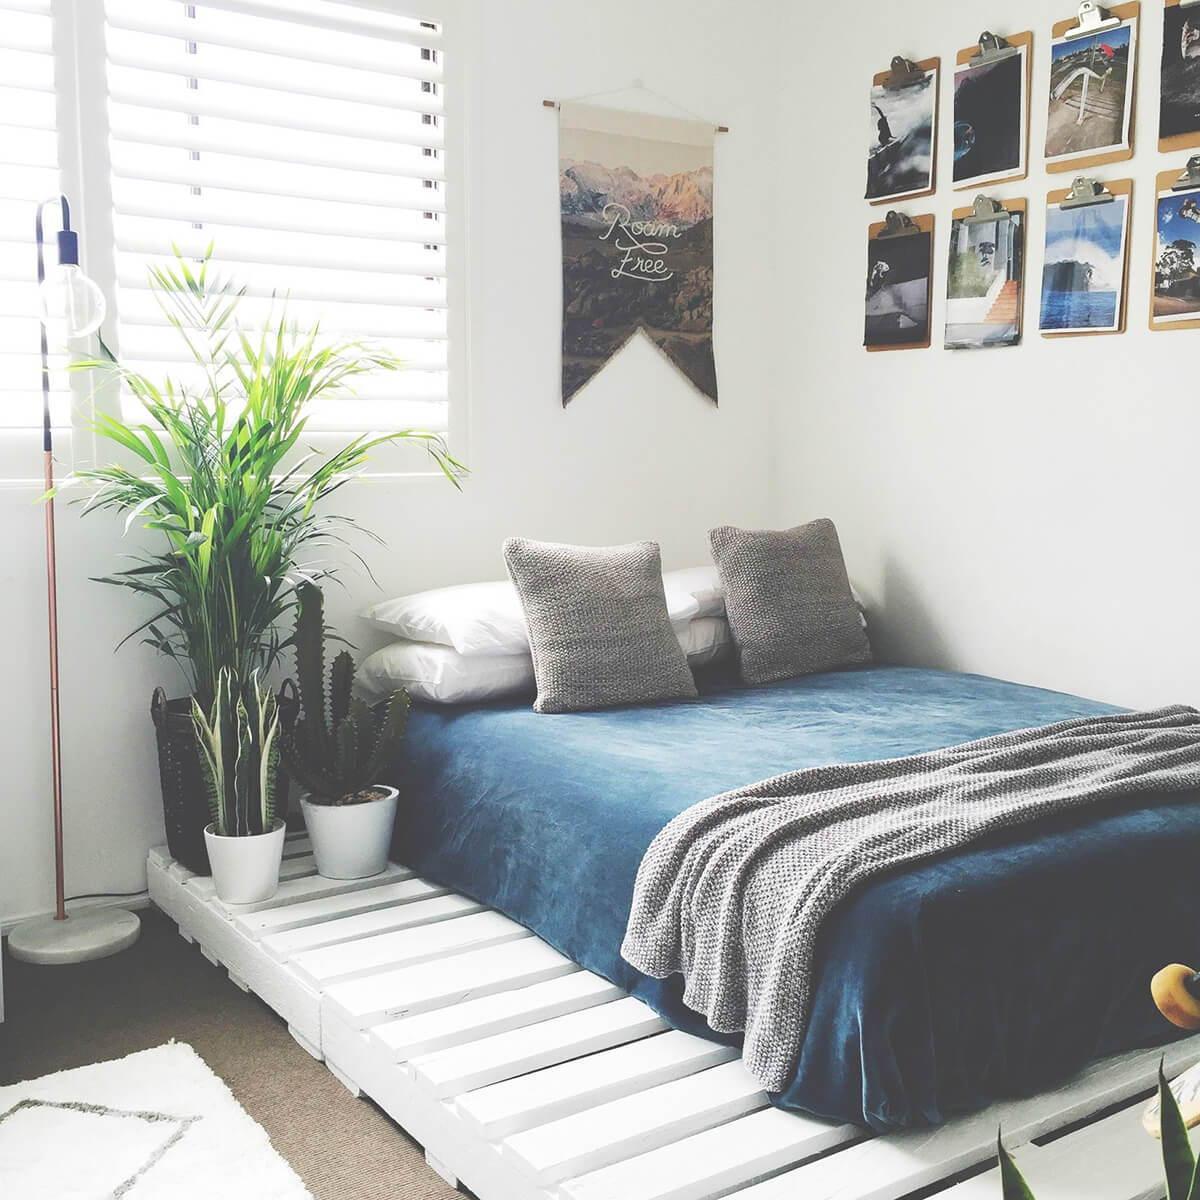 white pallet bed base on the floor